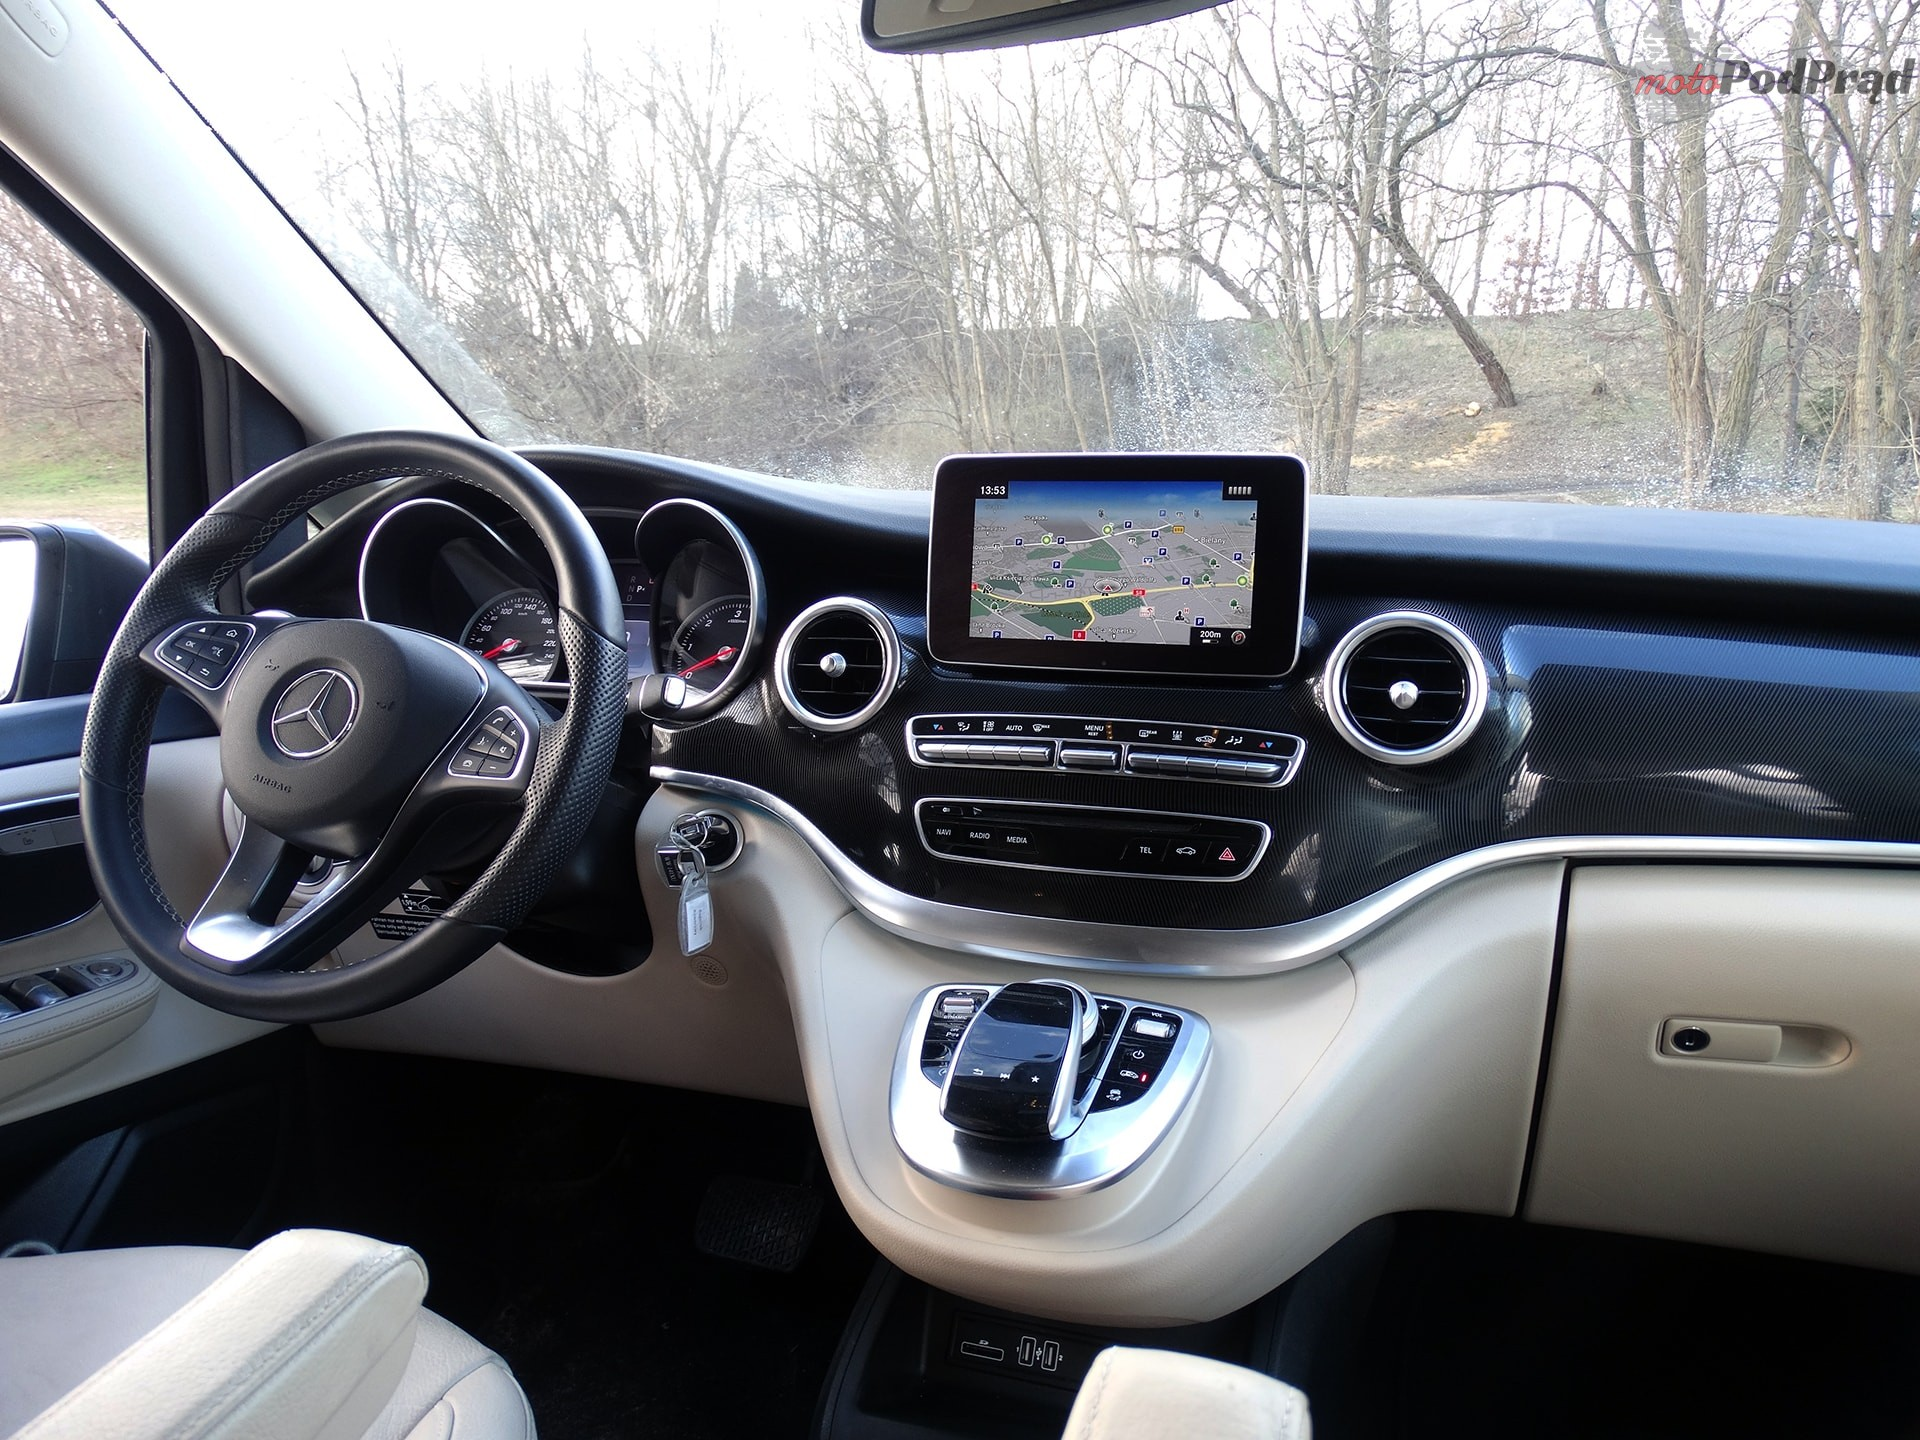 Mercedes Marco Polo 10 Test: Mercedes Benz Marco Polo pełen przygód...